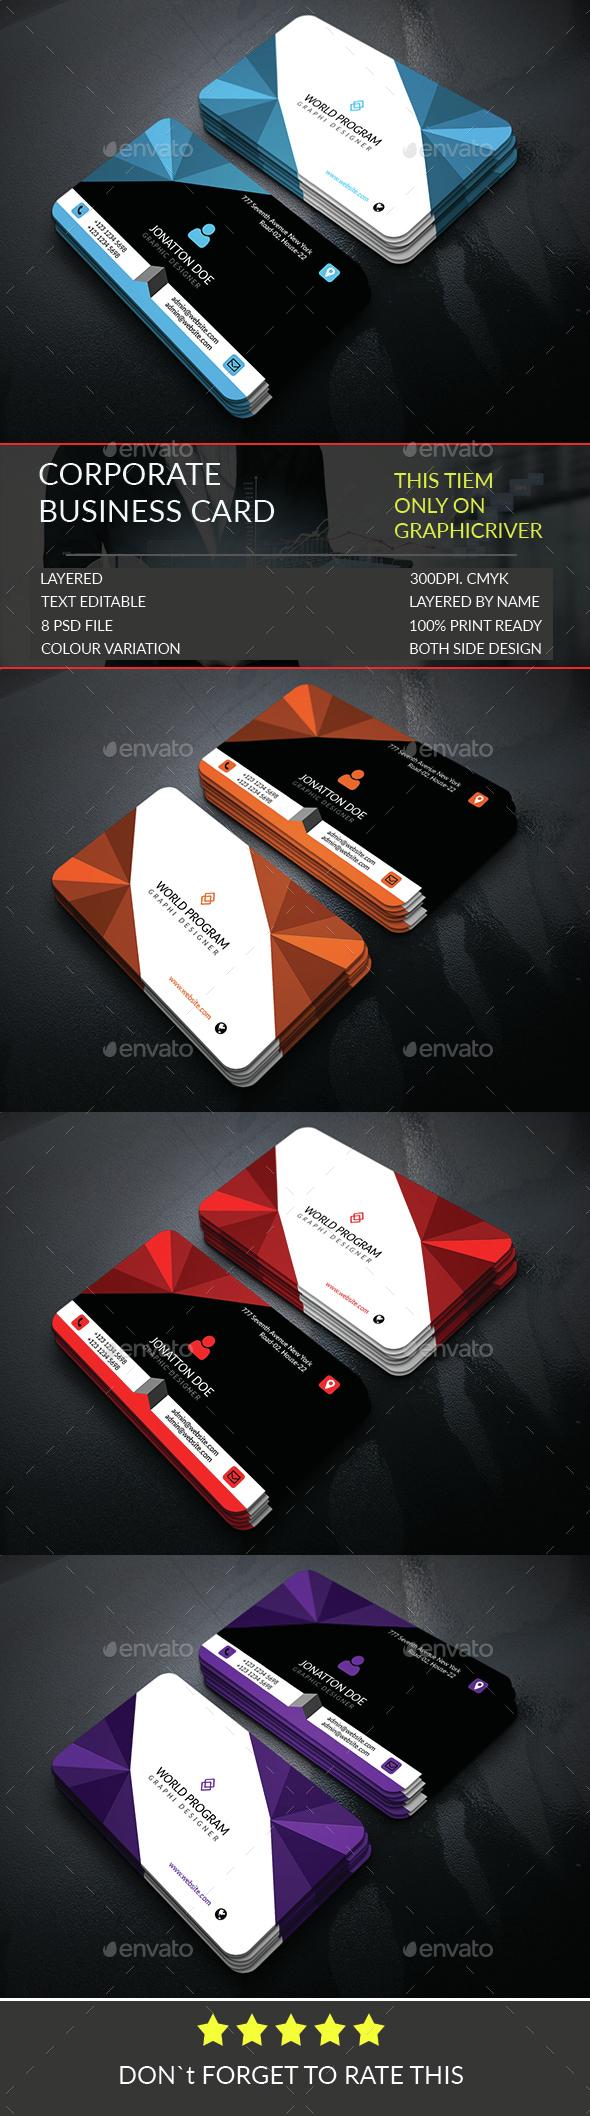 Corporate Business Card Template.242 - Corporate Business Cards